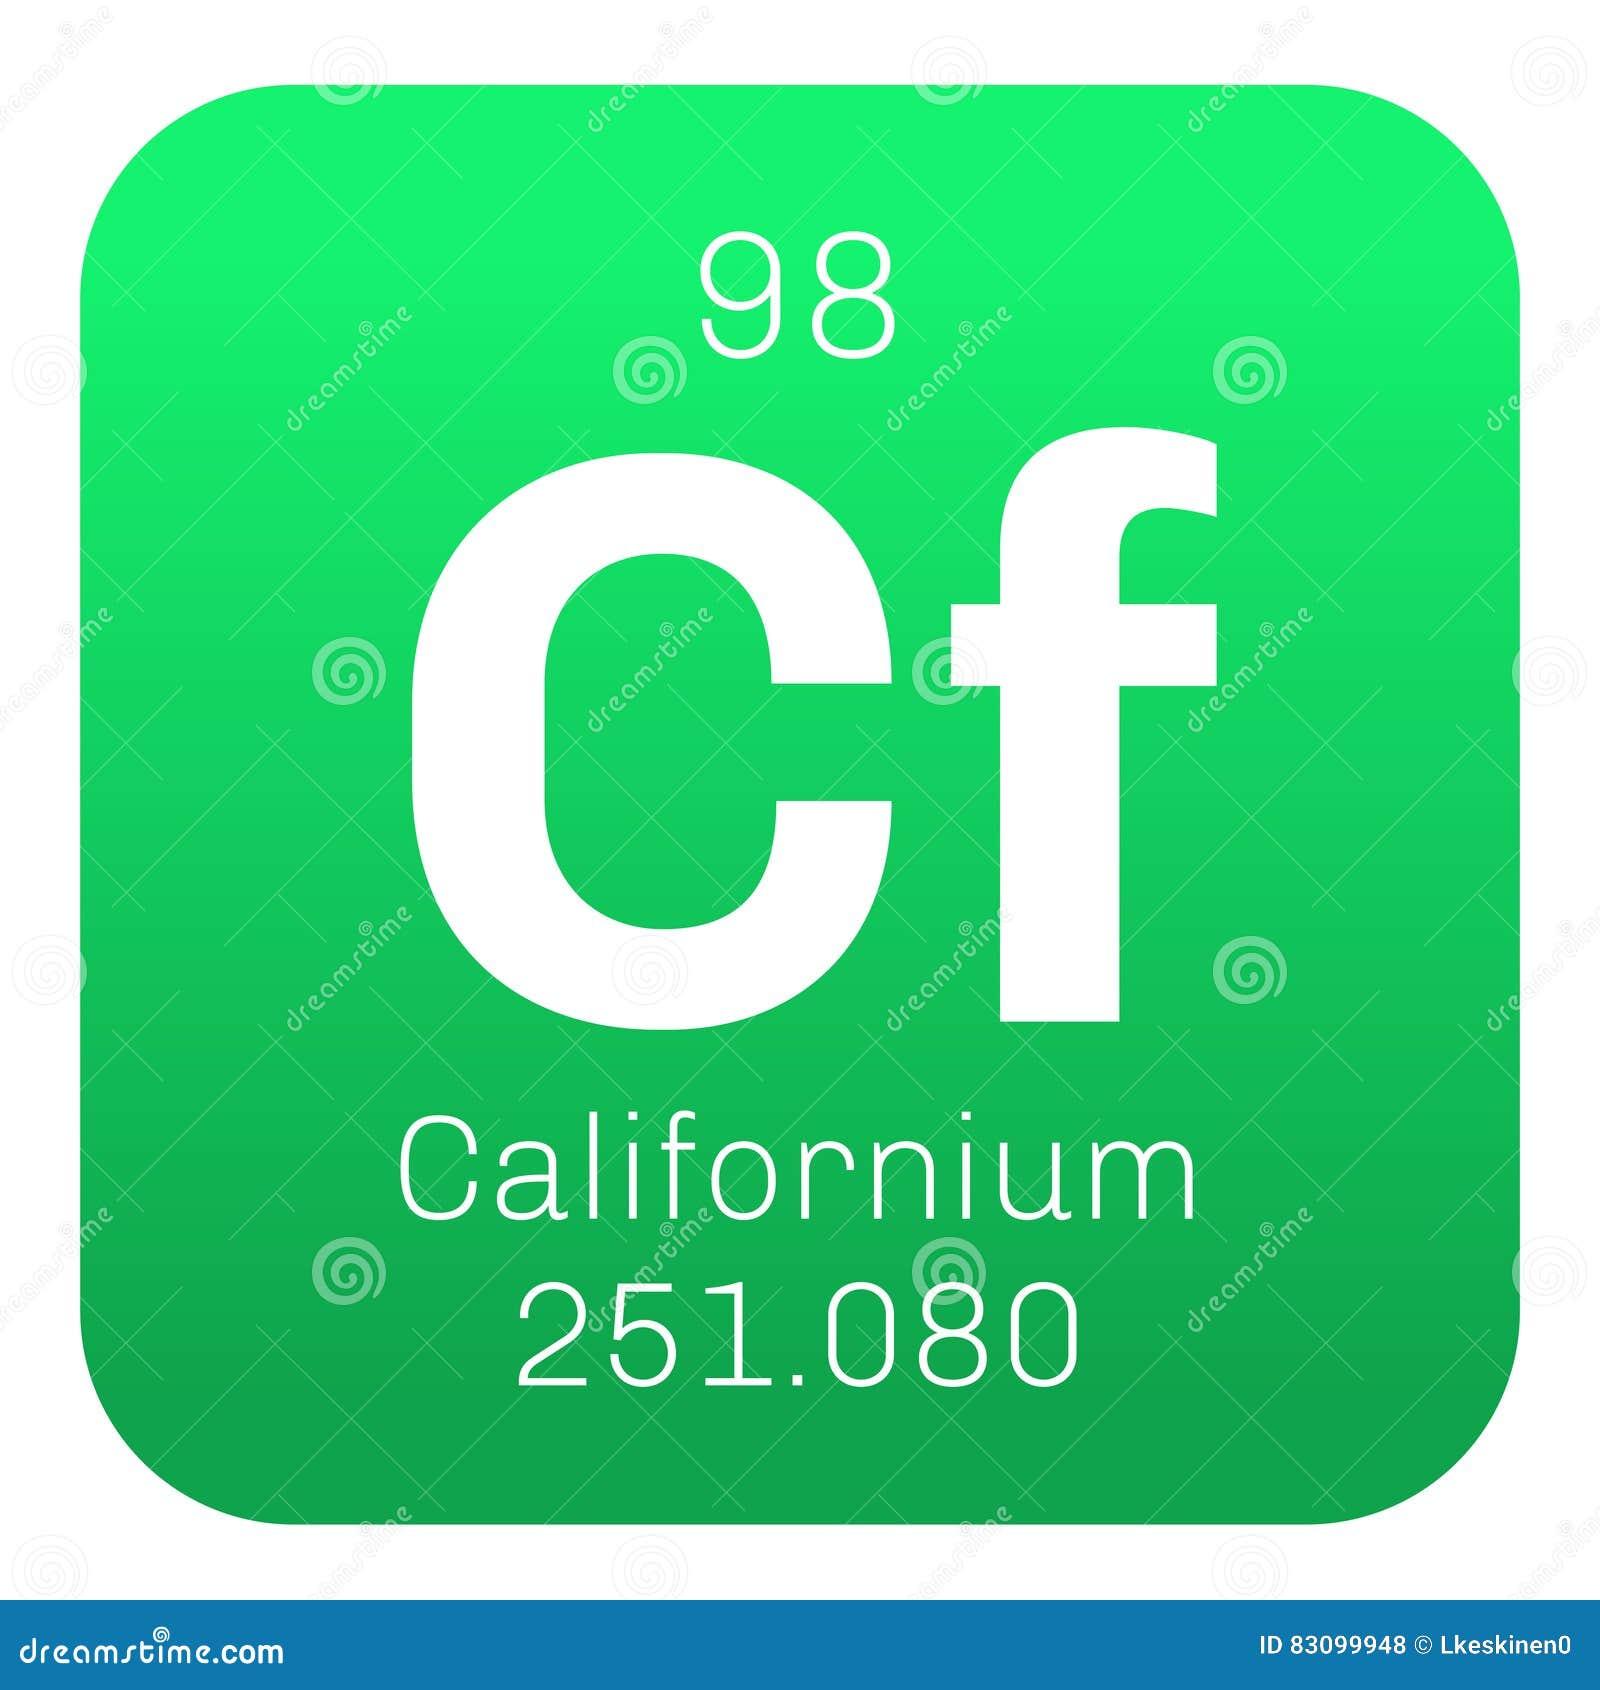 Californium chemical element stock vector image 83099948 californium chemical element gamestrikefo Images